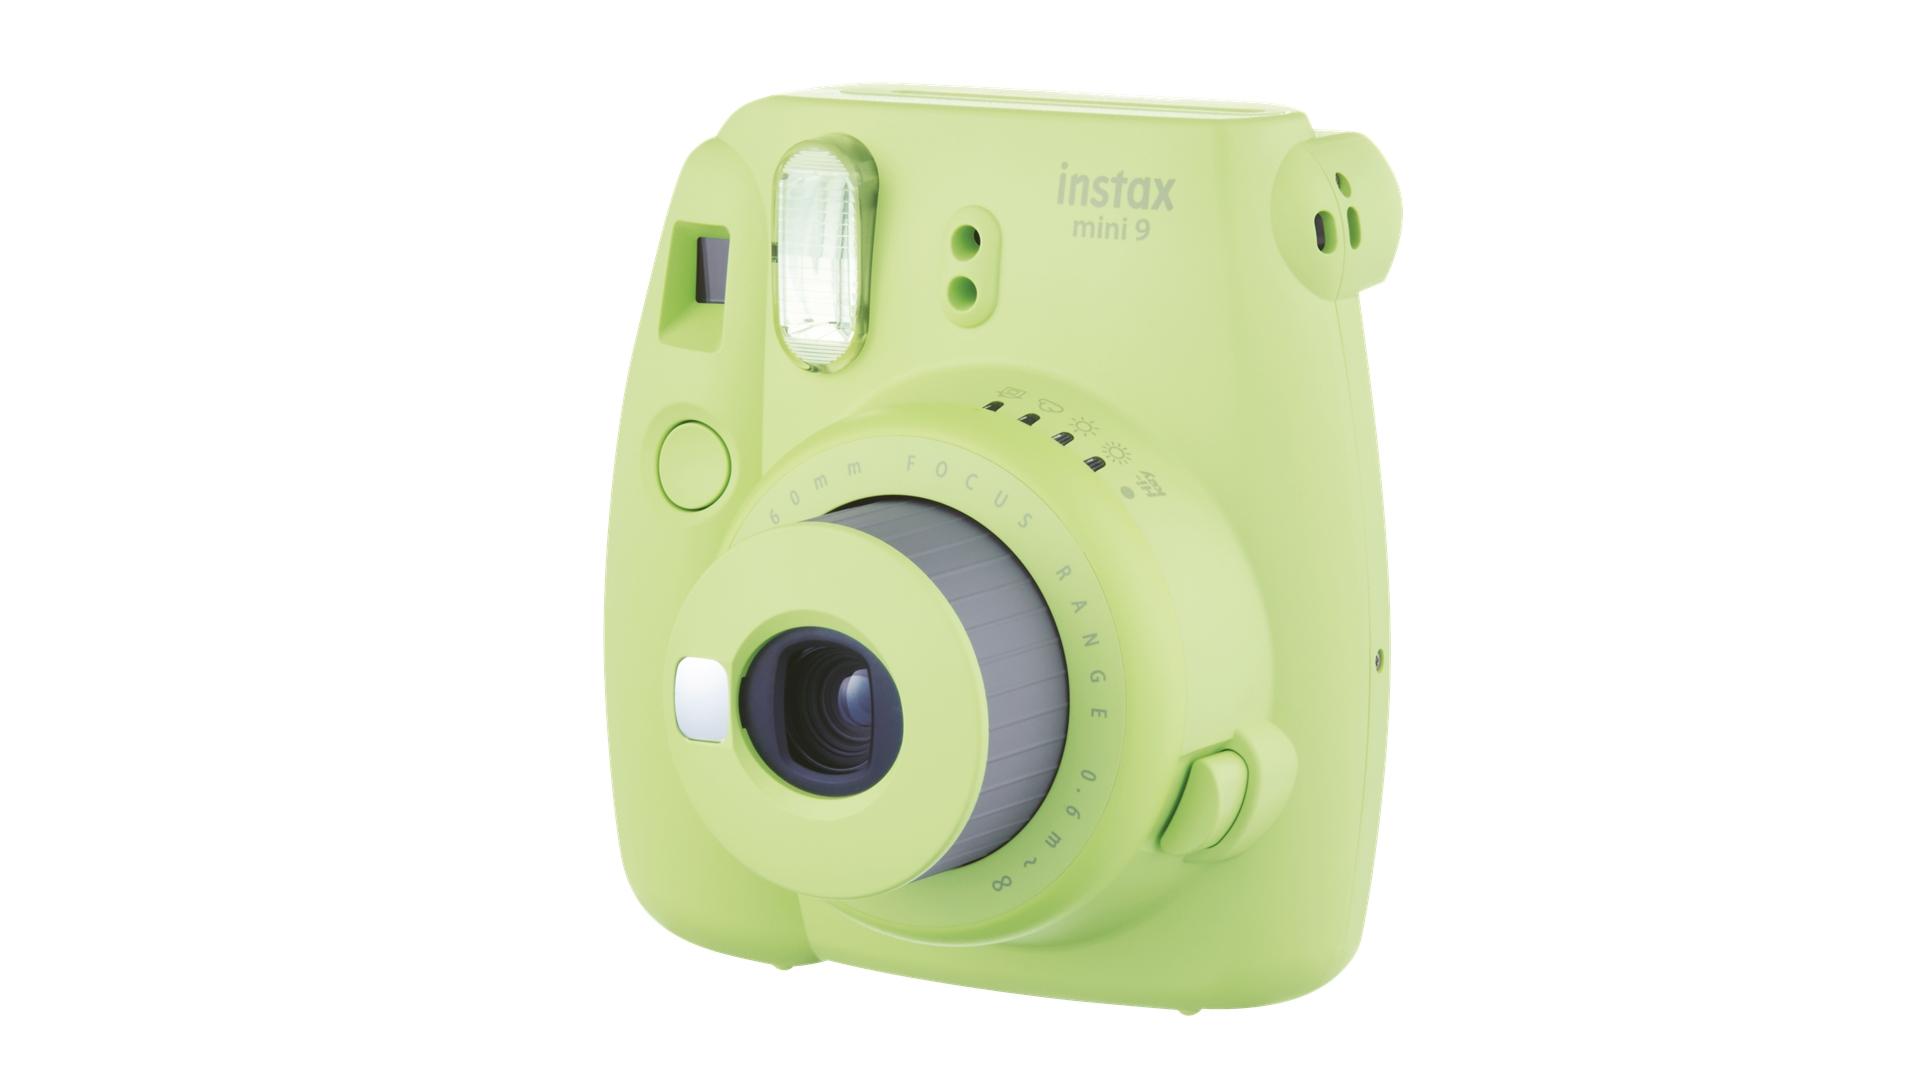 Fujifilm Instax Mini 9 prices